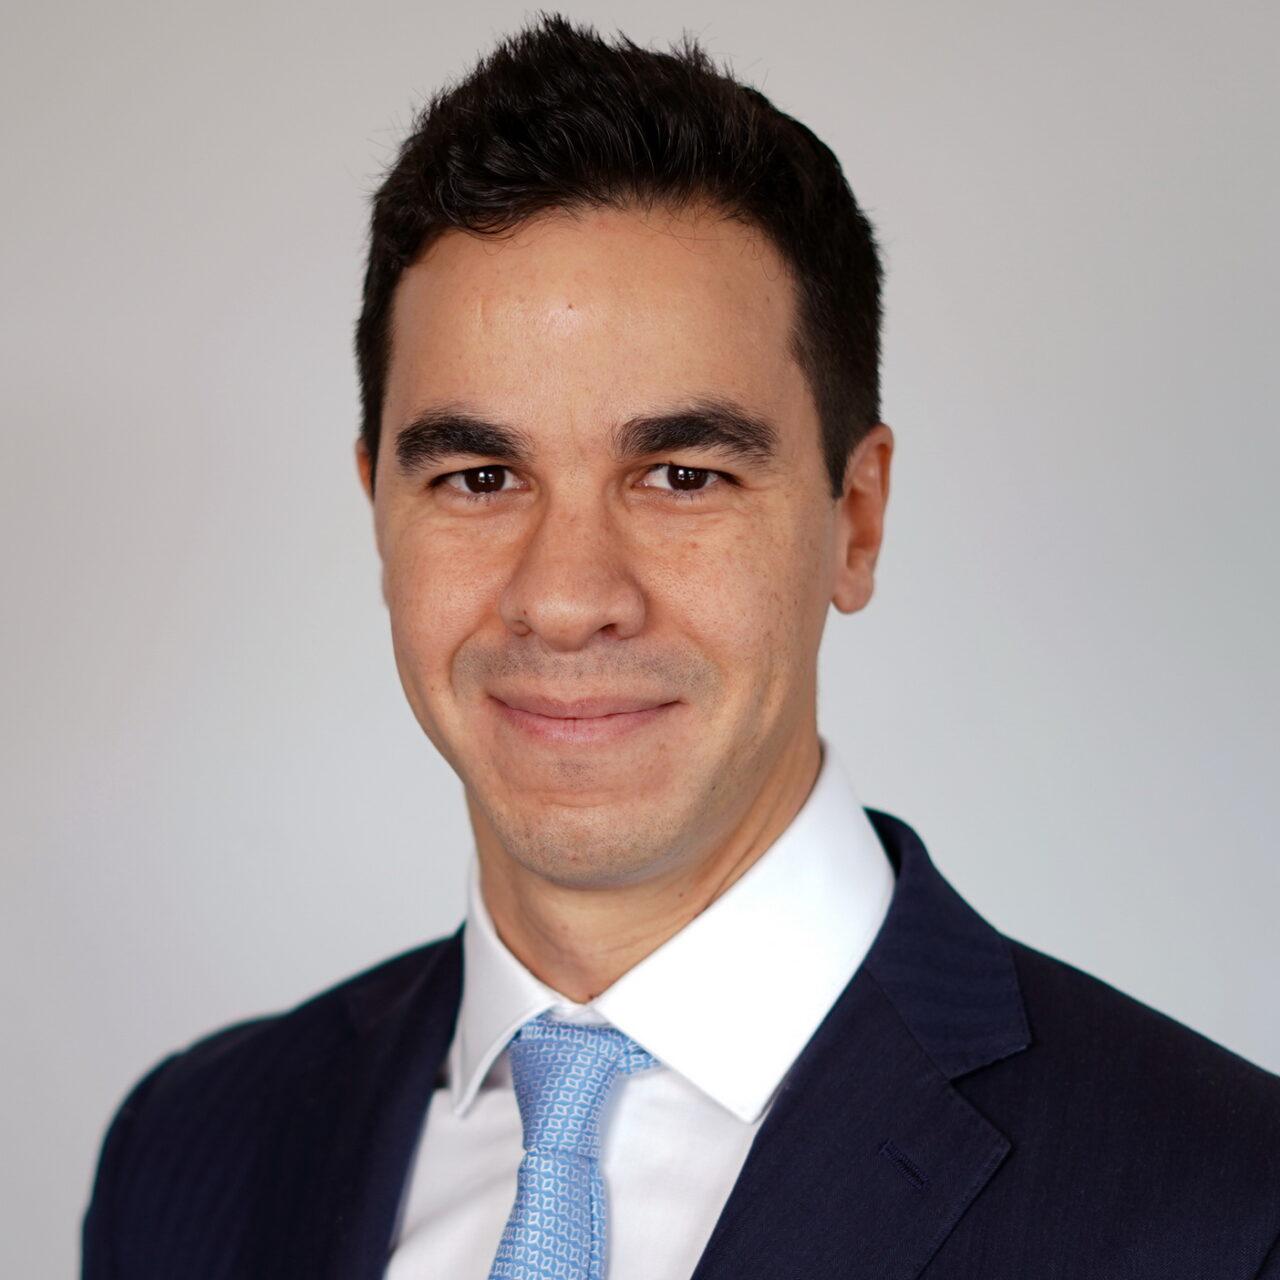 Candriam ernennt Paulo Salazar zum Co-Head of Emerging Markets Equities